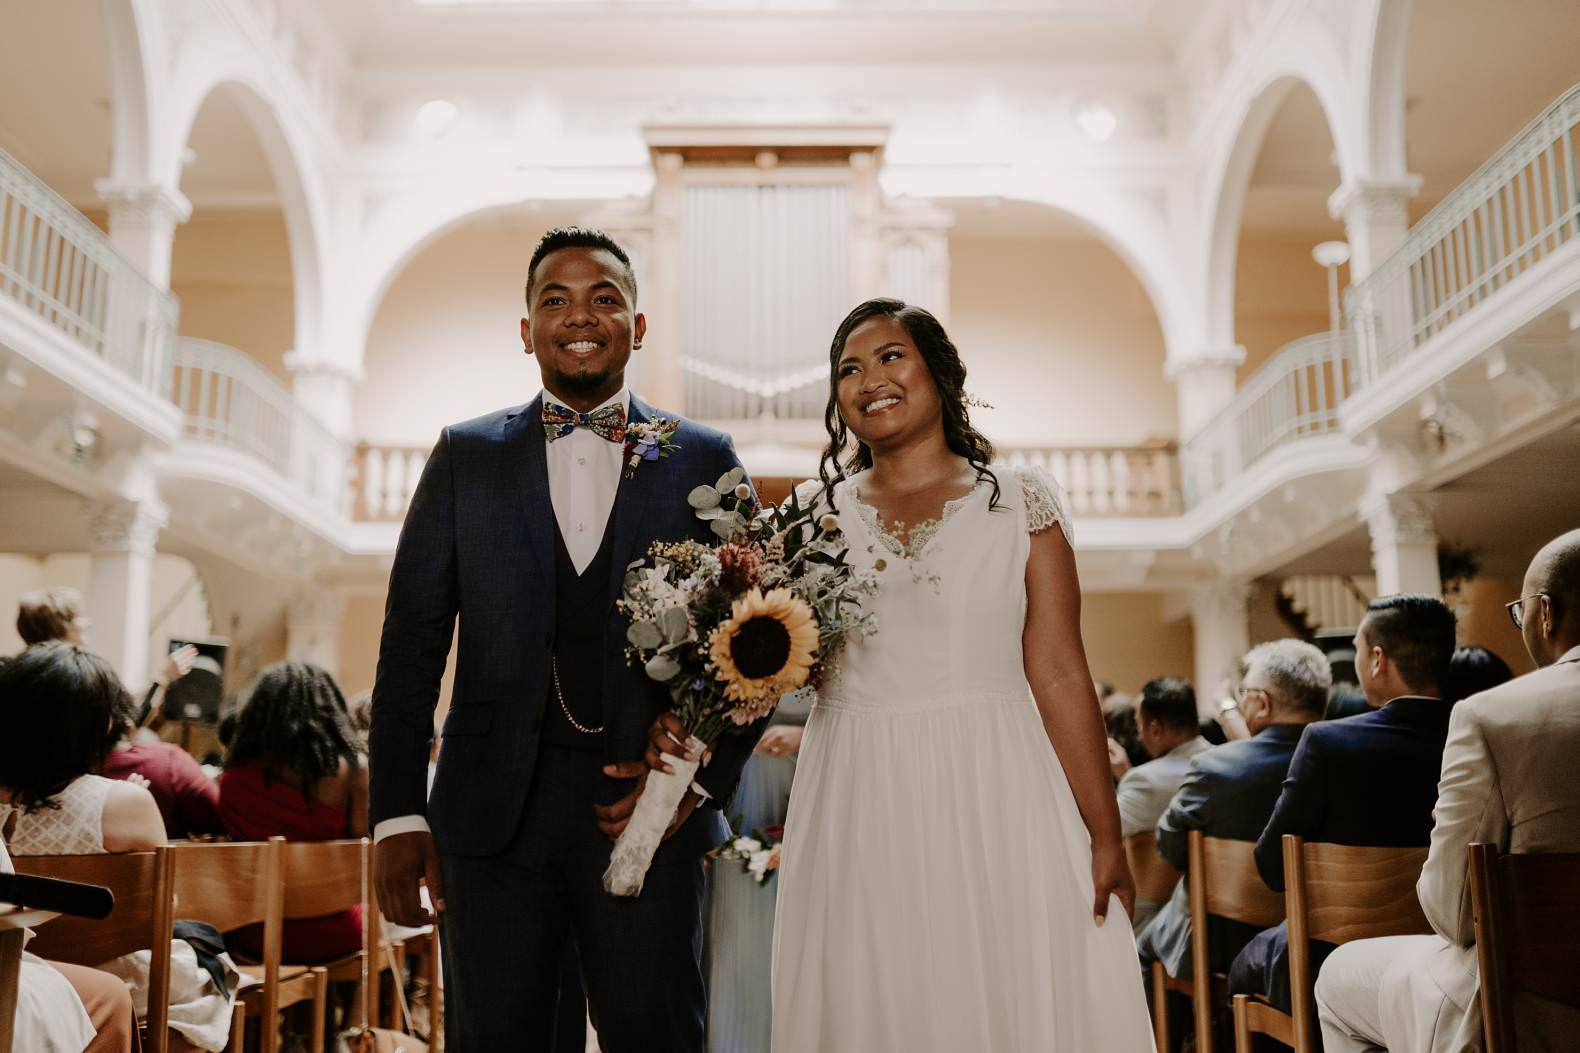 mariage manoir de corny photographe bel esprit 0032 1